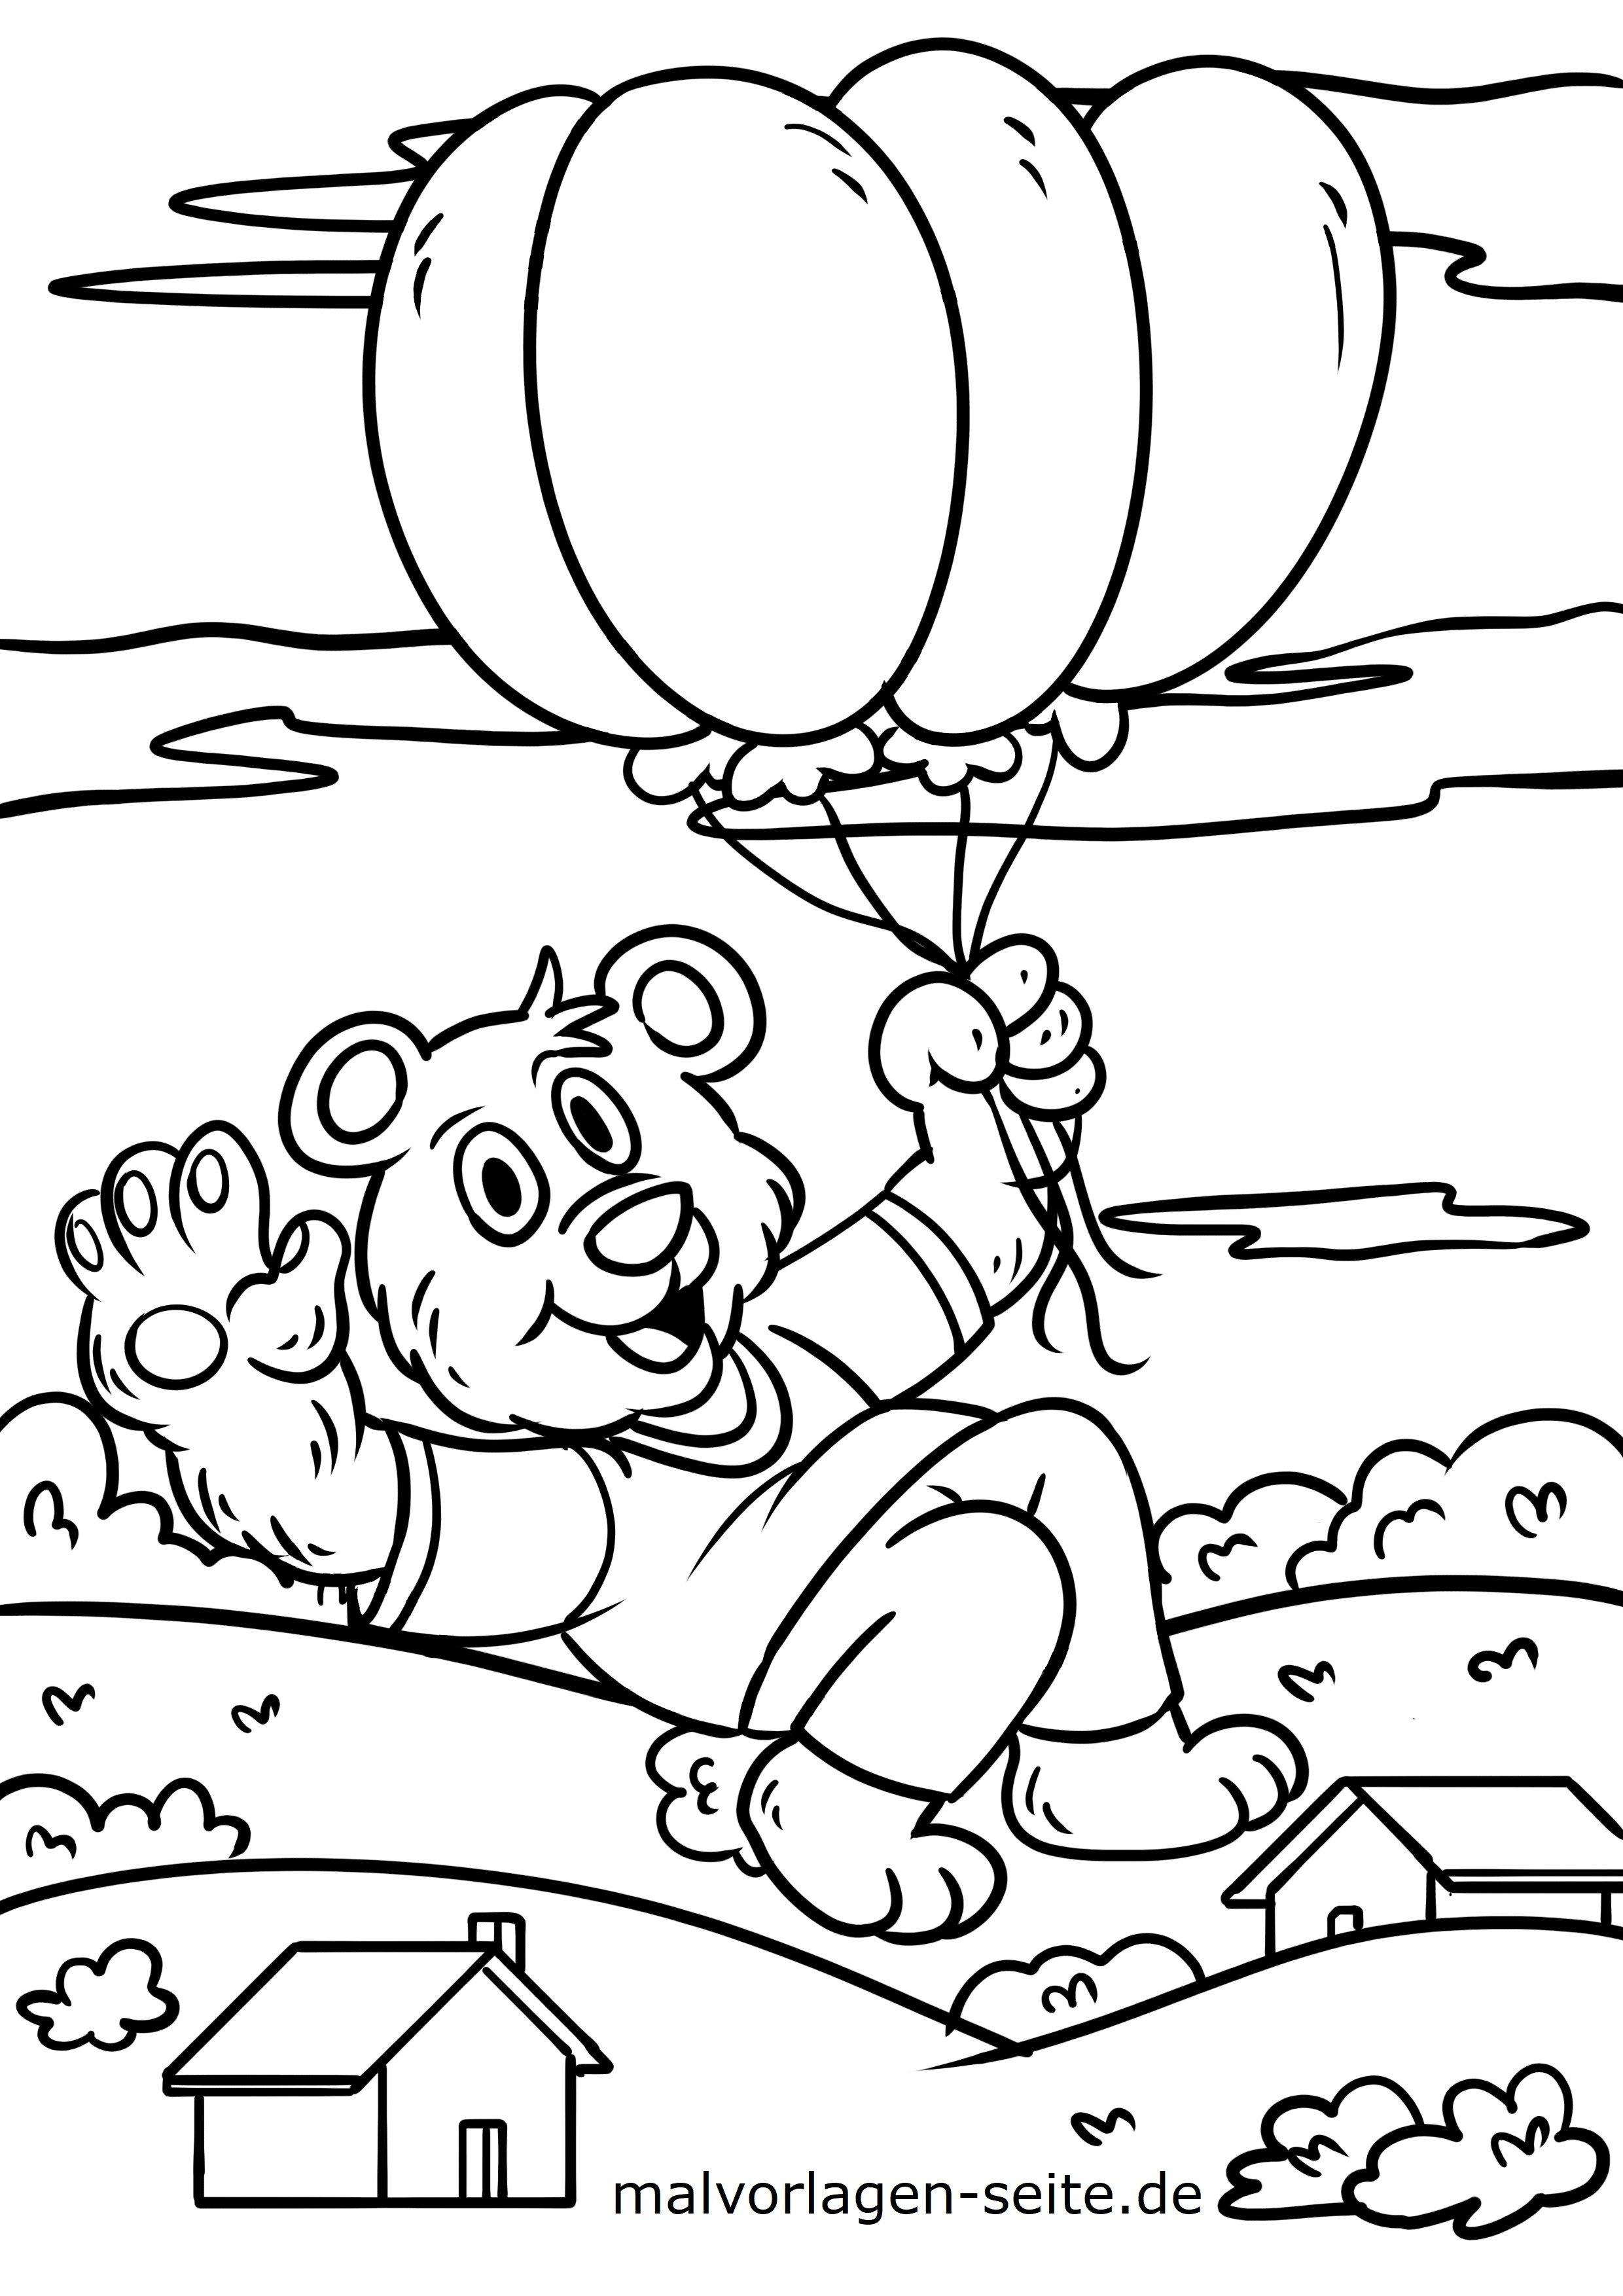 Malvorlage Bär Mit Lufballons